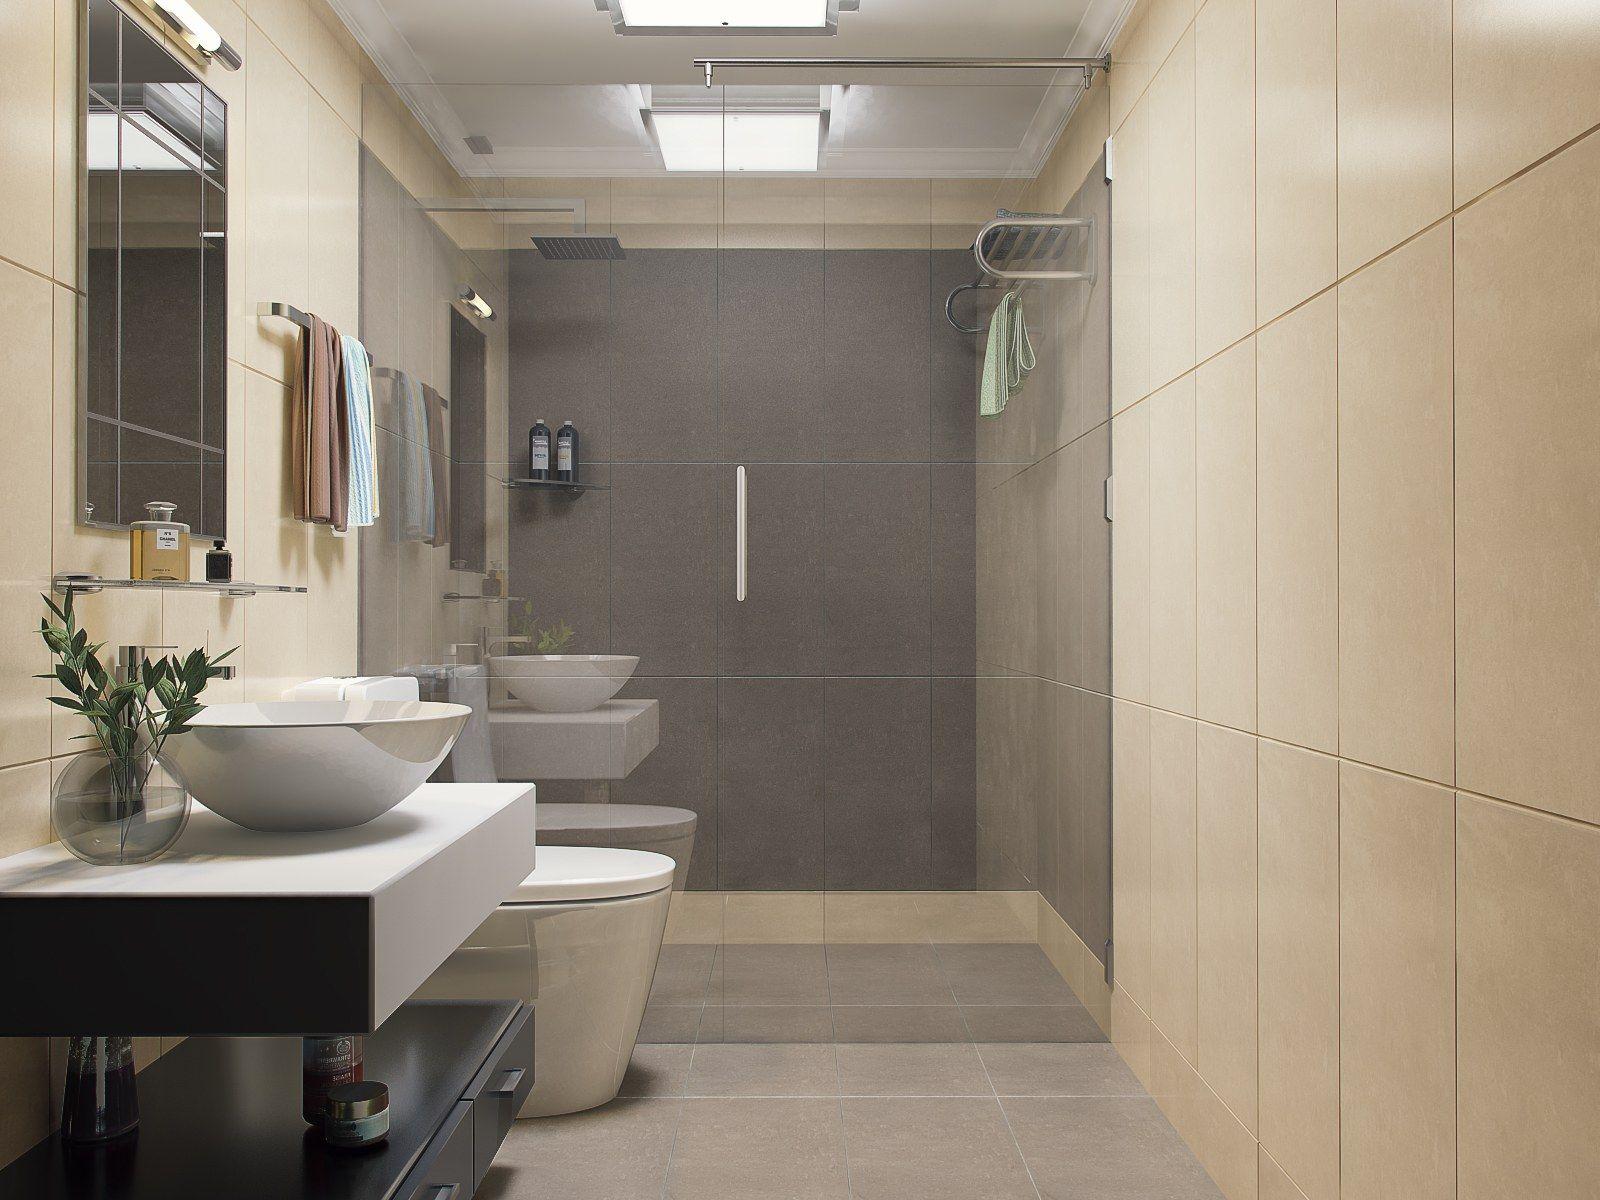 Sketchup Free 3d Model Bathroom Visopt By Hữu Phước Interior